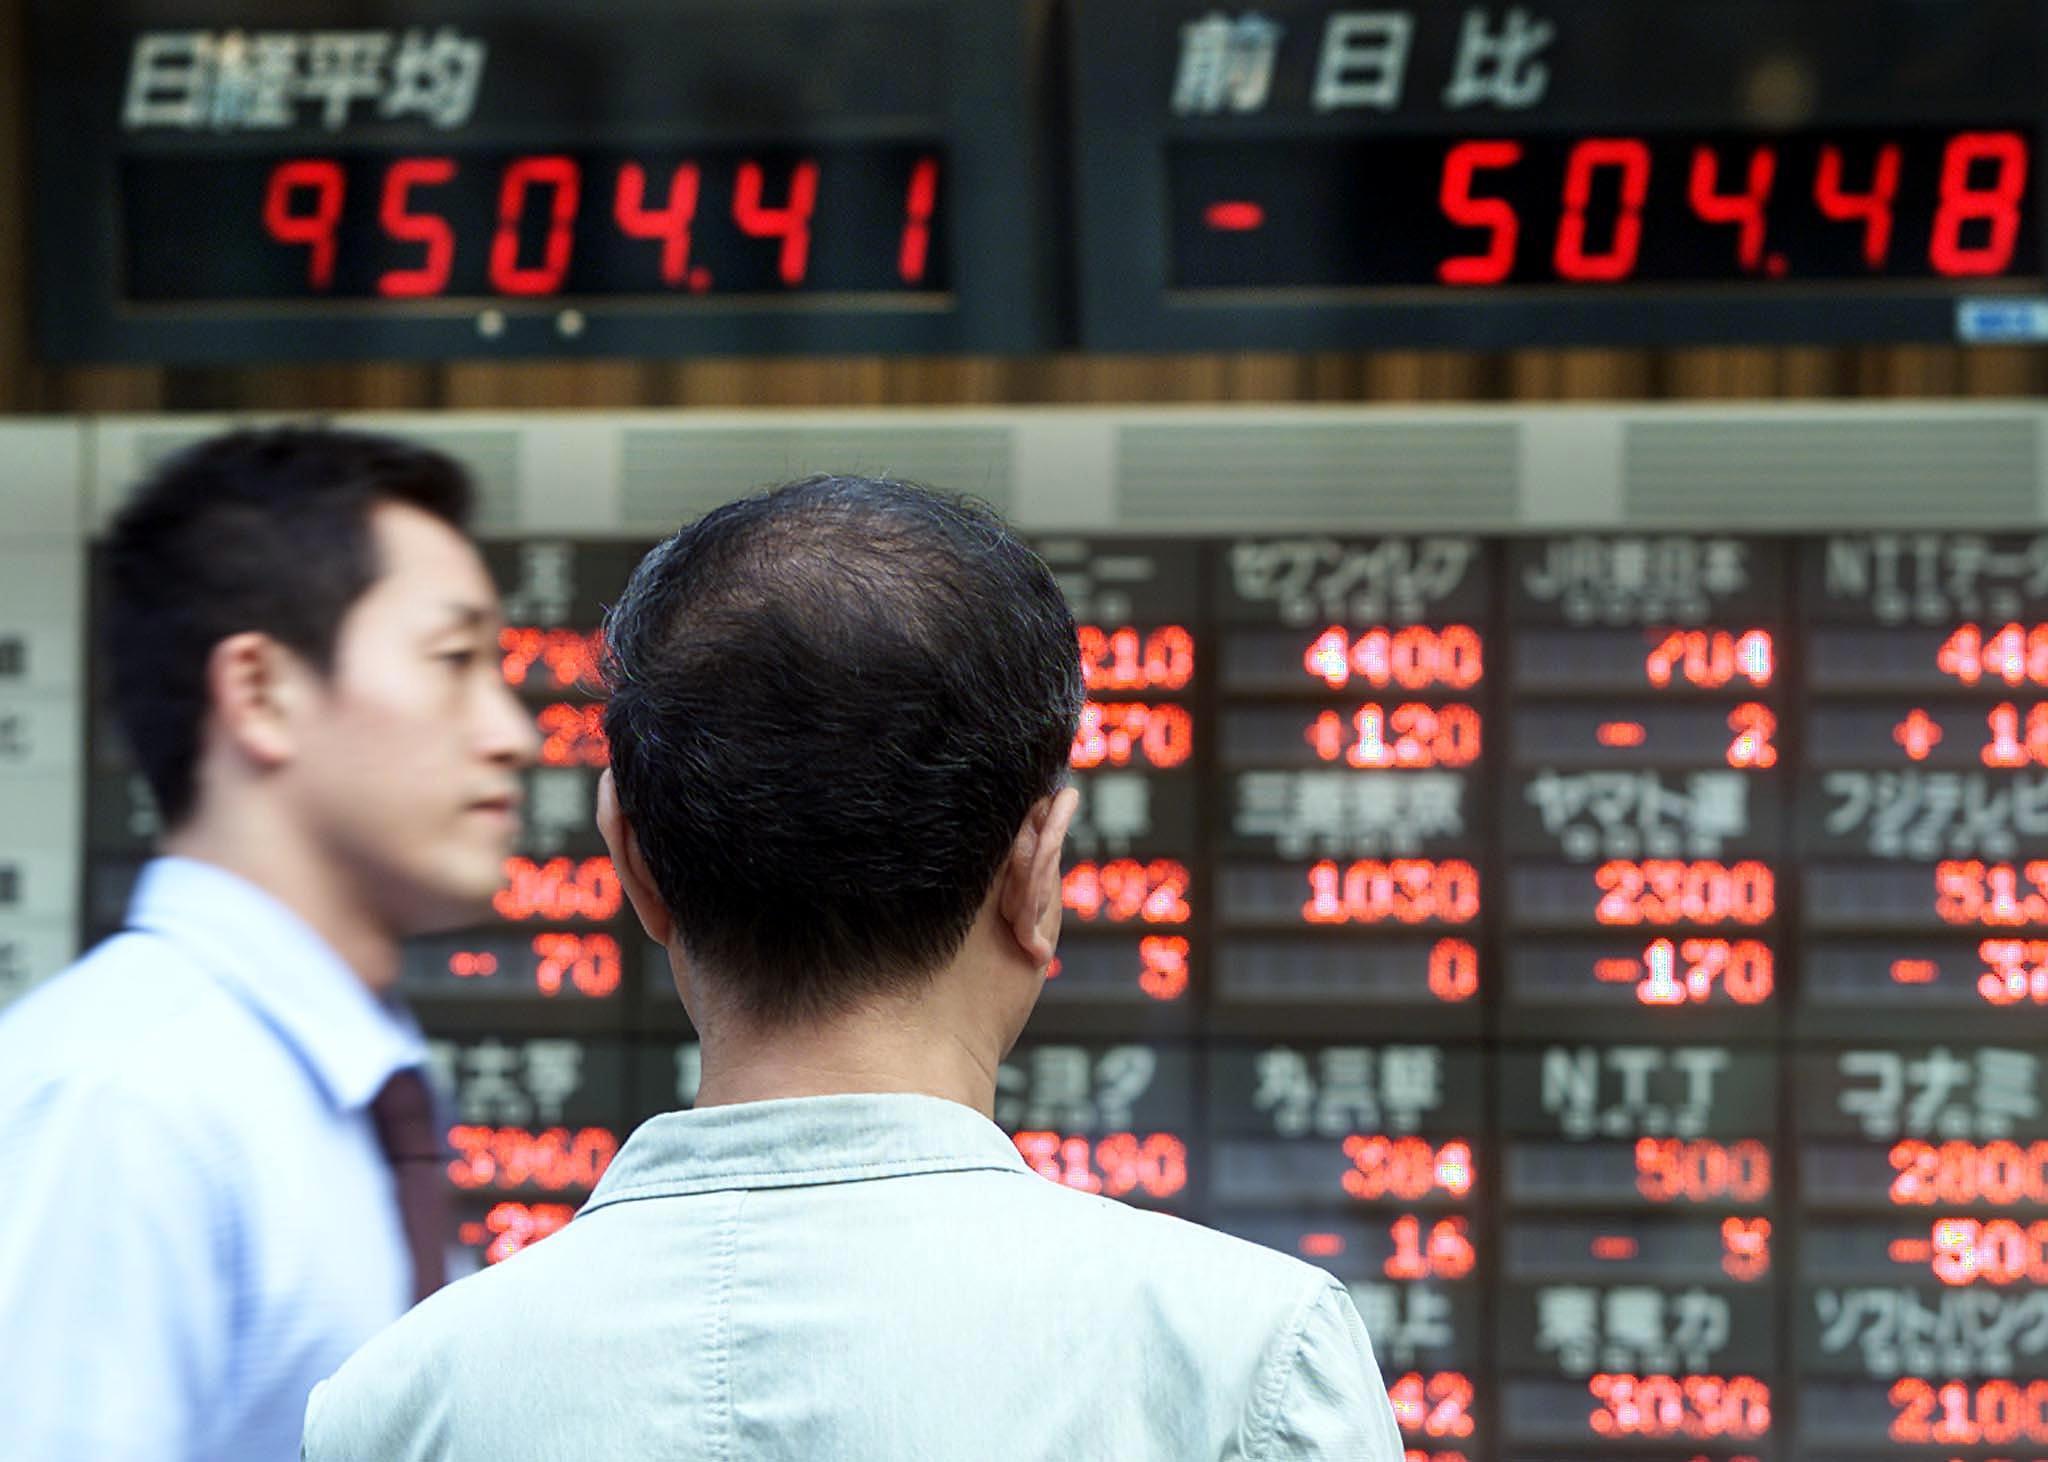 Borse Asia, spinta da taglio tasse Usa